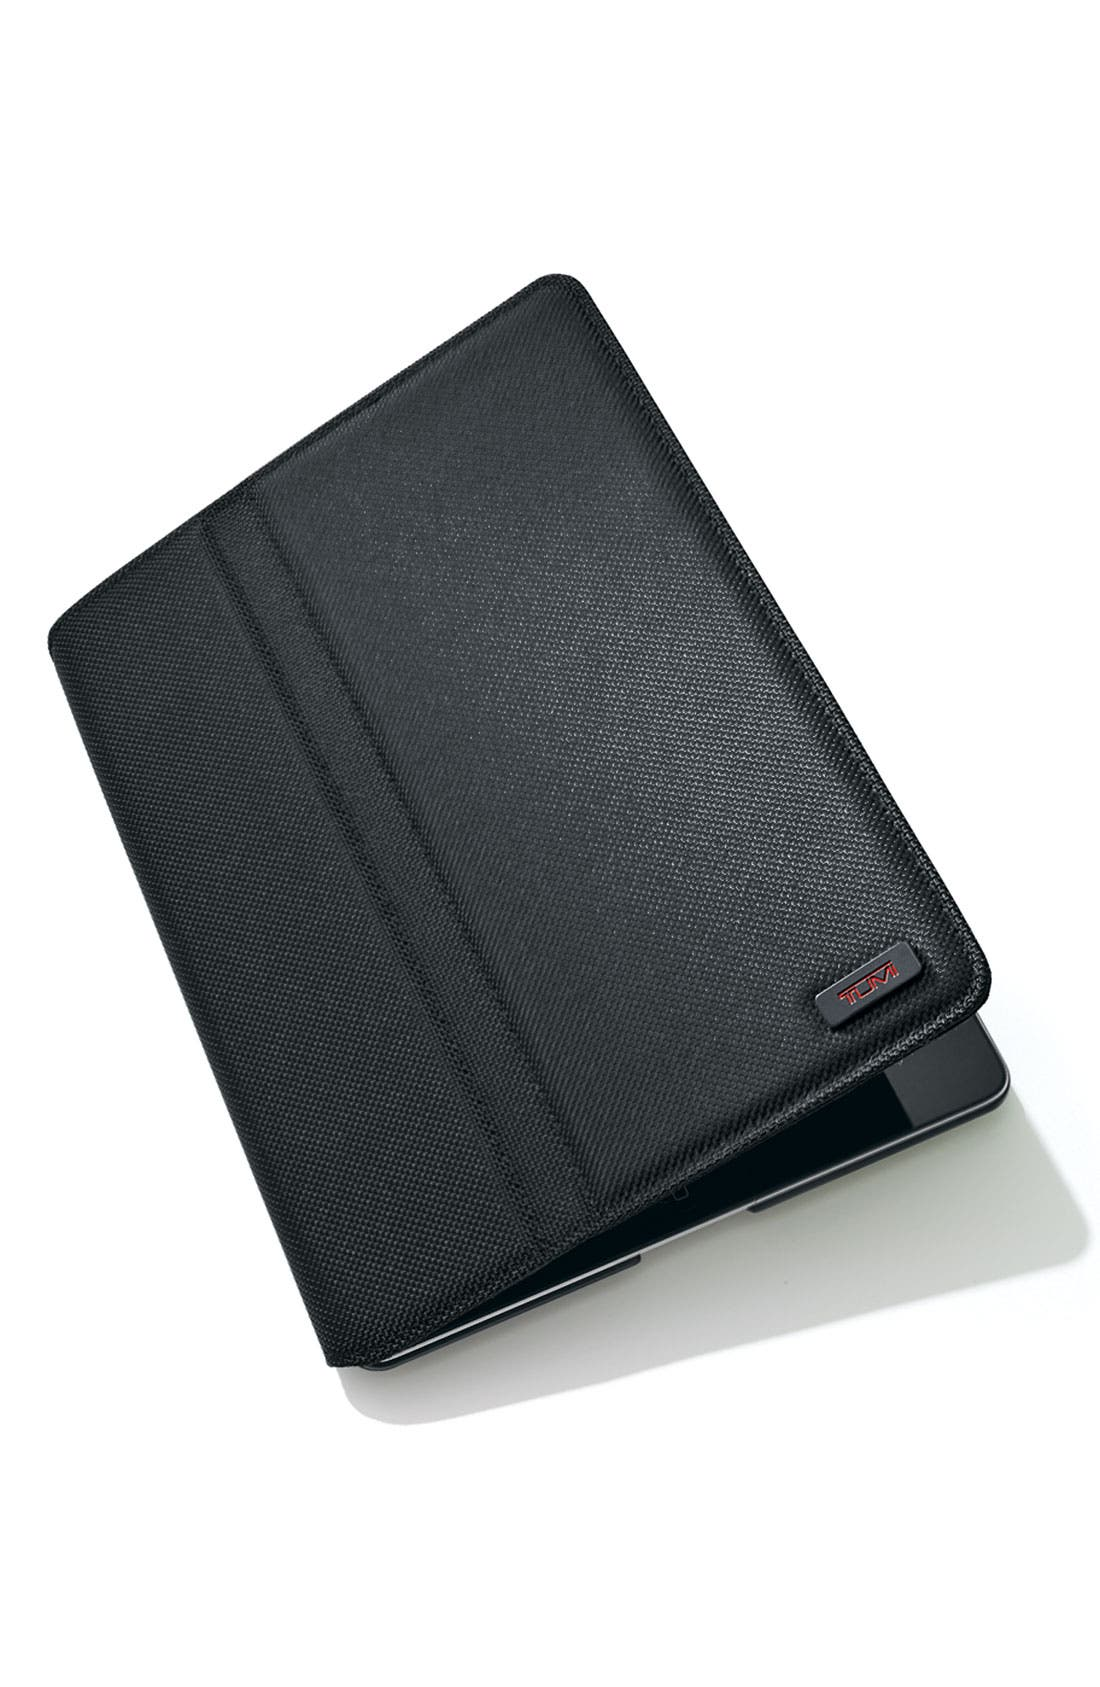 Ballistic Nylon iPad 2 Cover,                             Alternate thumbnail 2, color,                             Black